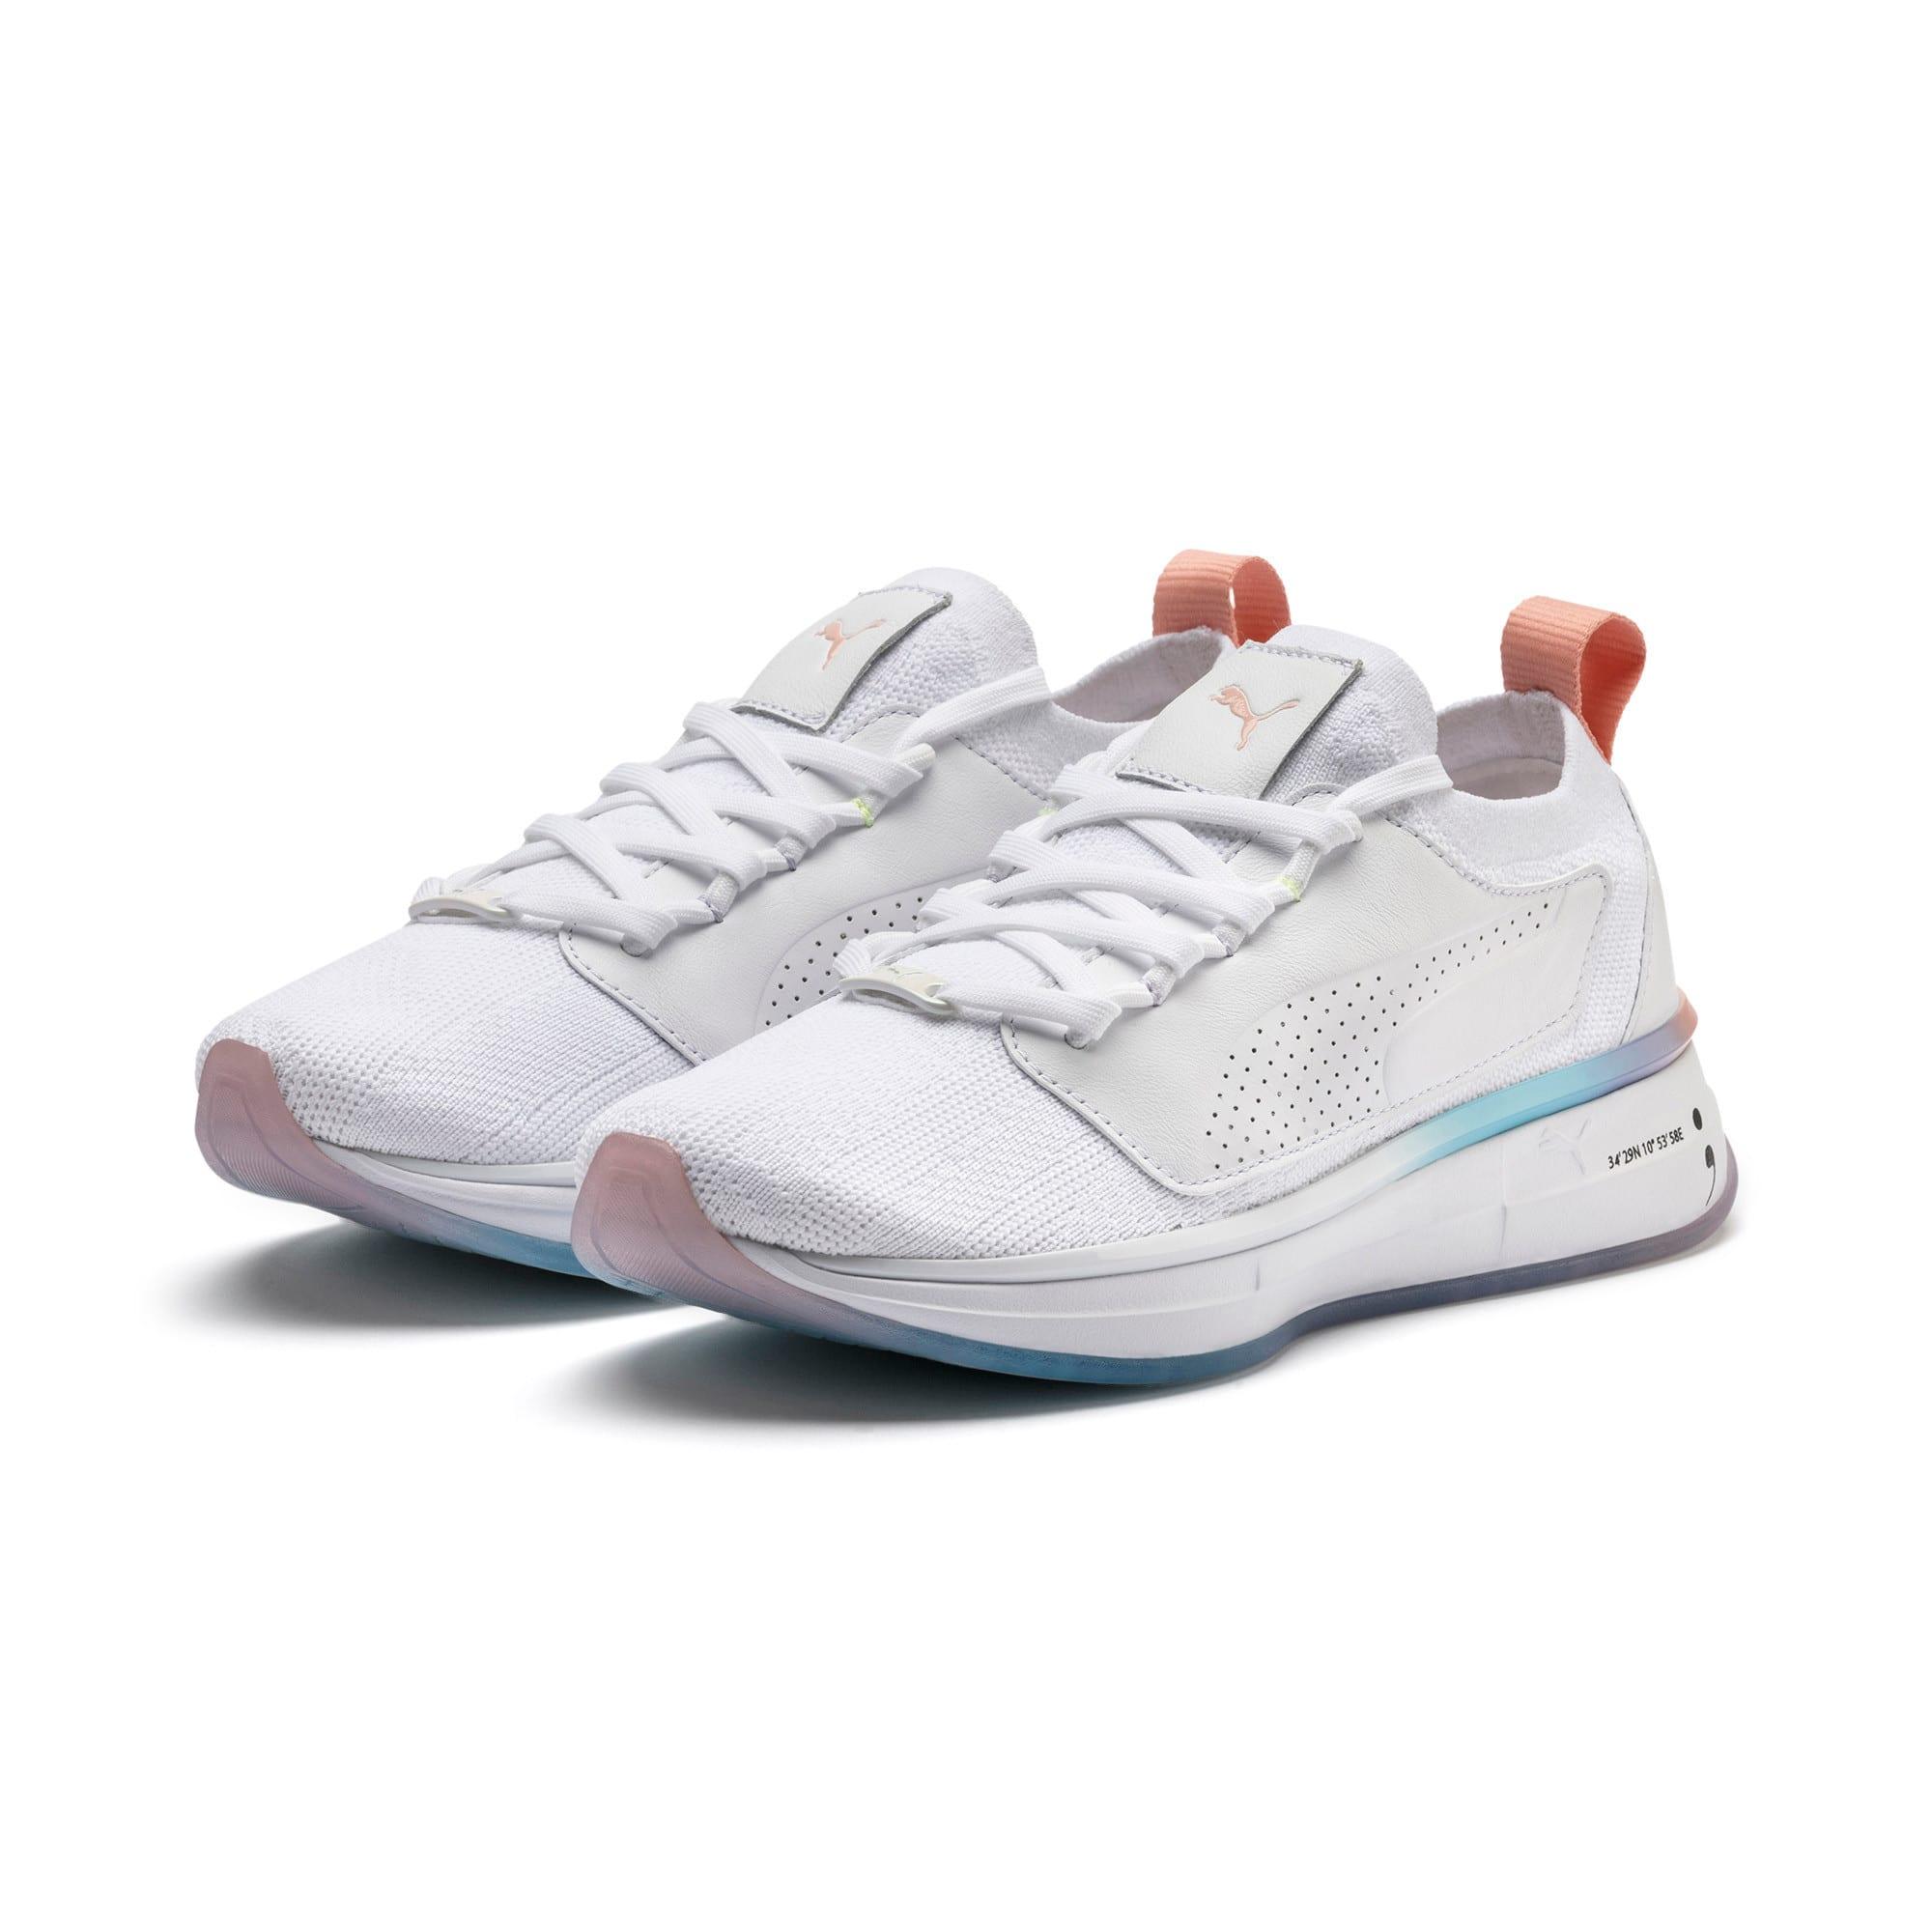 Miniatura 3 de Zapatos de entrenamiento SG Runner Ice para mujer, Puma White-Peach Bud, mediano